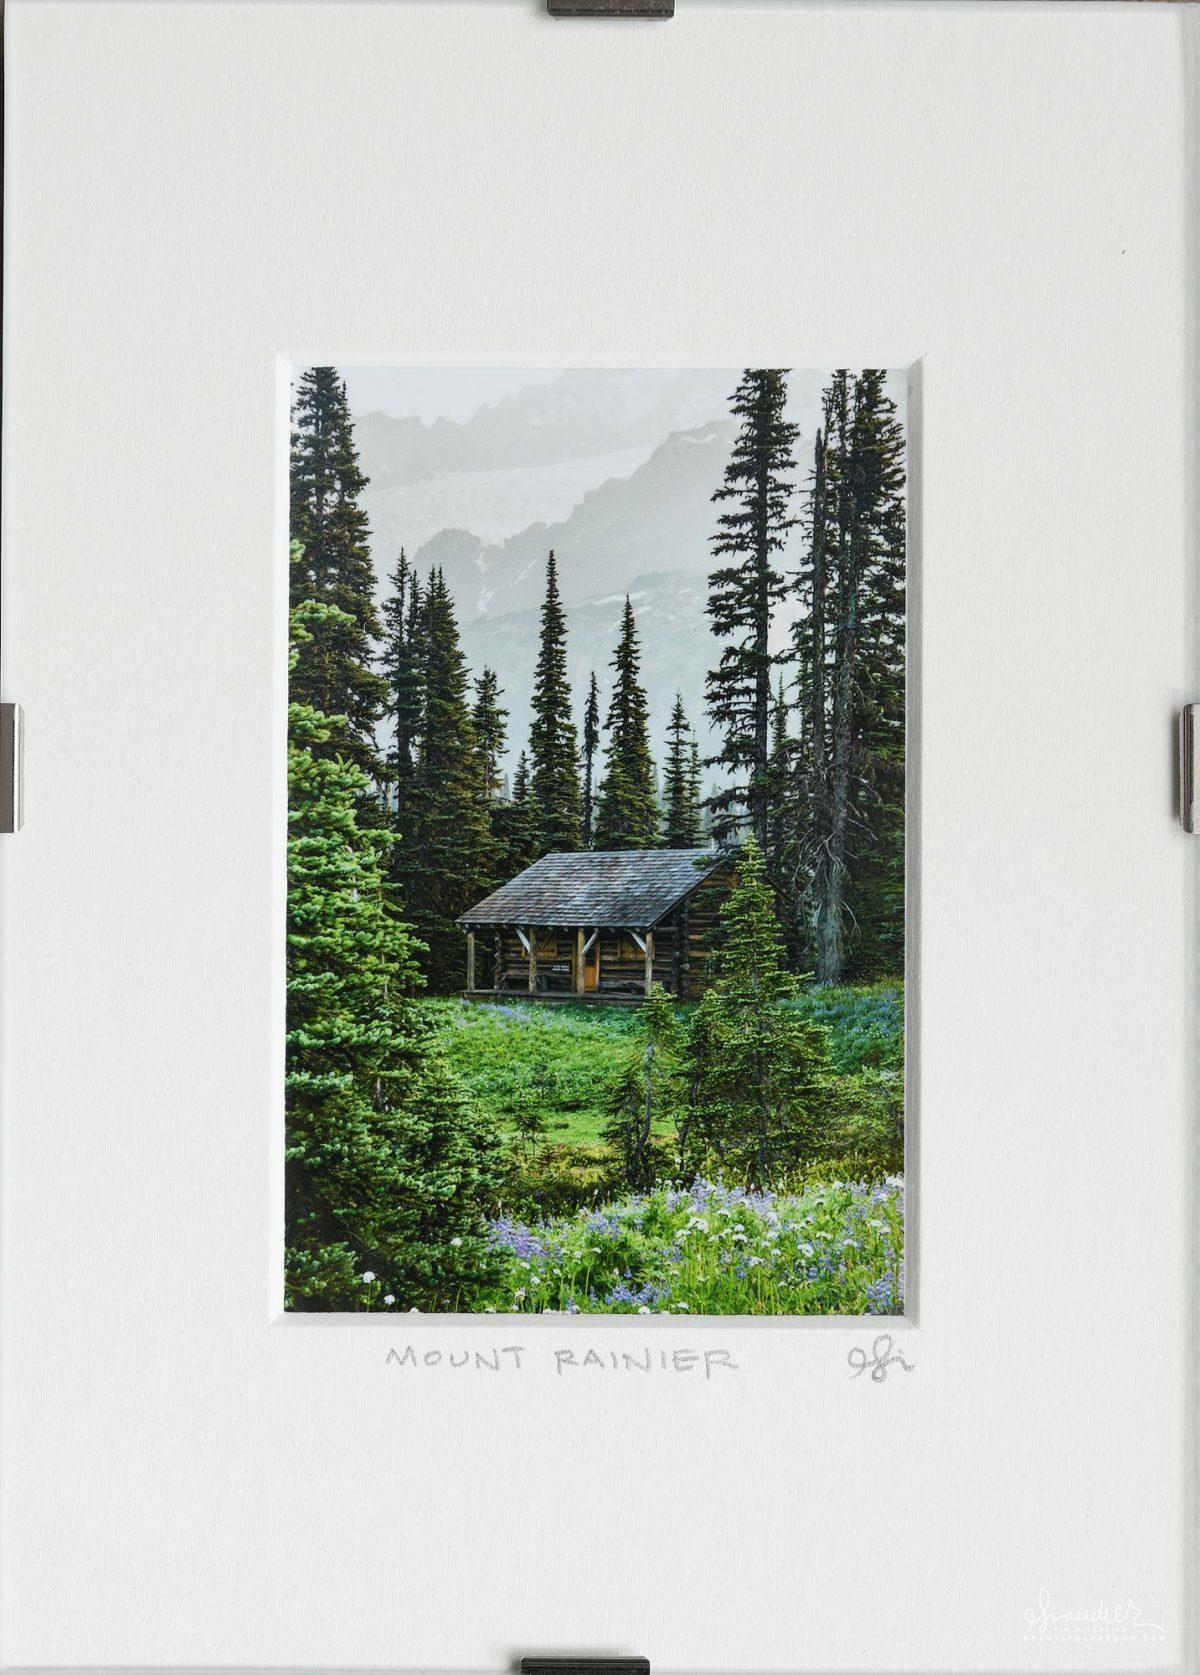 Cabin at Indian Henry's, Mount Rainier, Washington Cascades